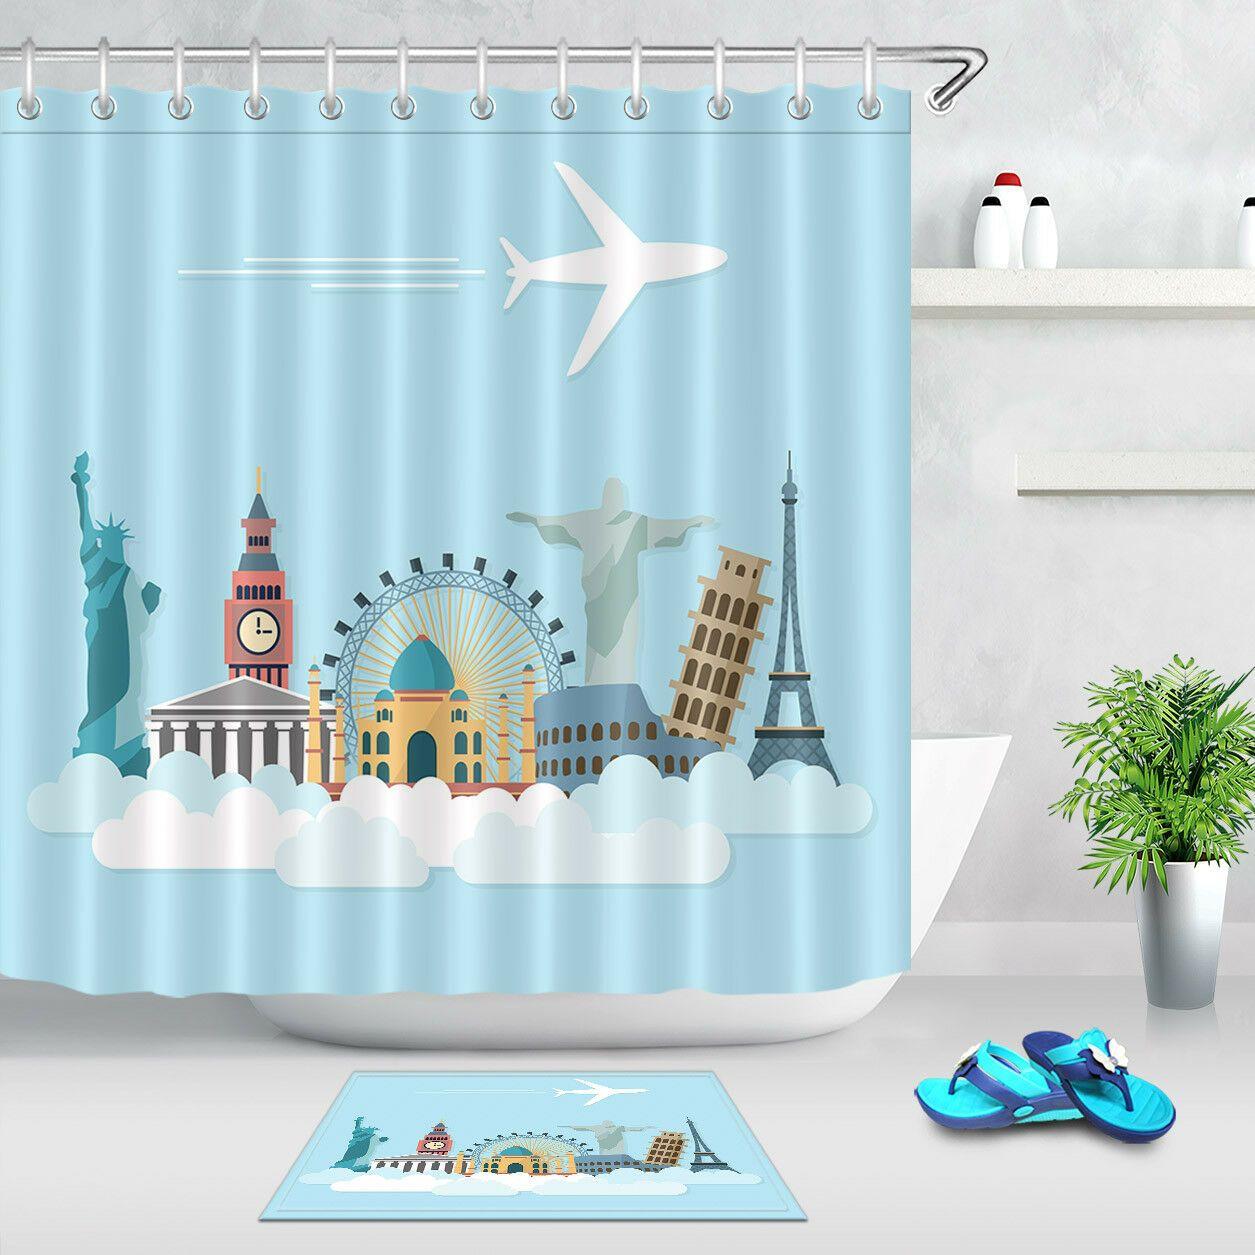 Cartoon City Airplane 7171 Waterproof Fabric Shower Curtain Set Bathroom Decor Bathroom Decor Ideas Of Bathr Bathroom Decor Bathroom Printed Shower Curtain